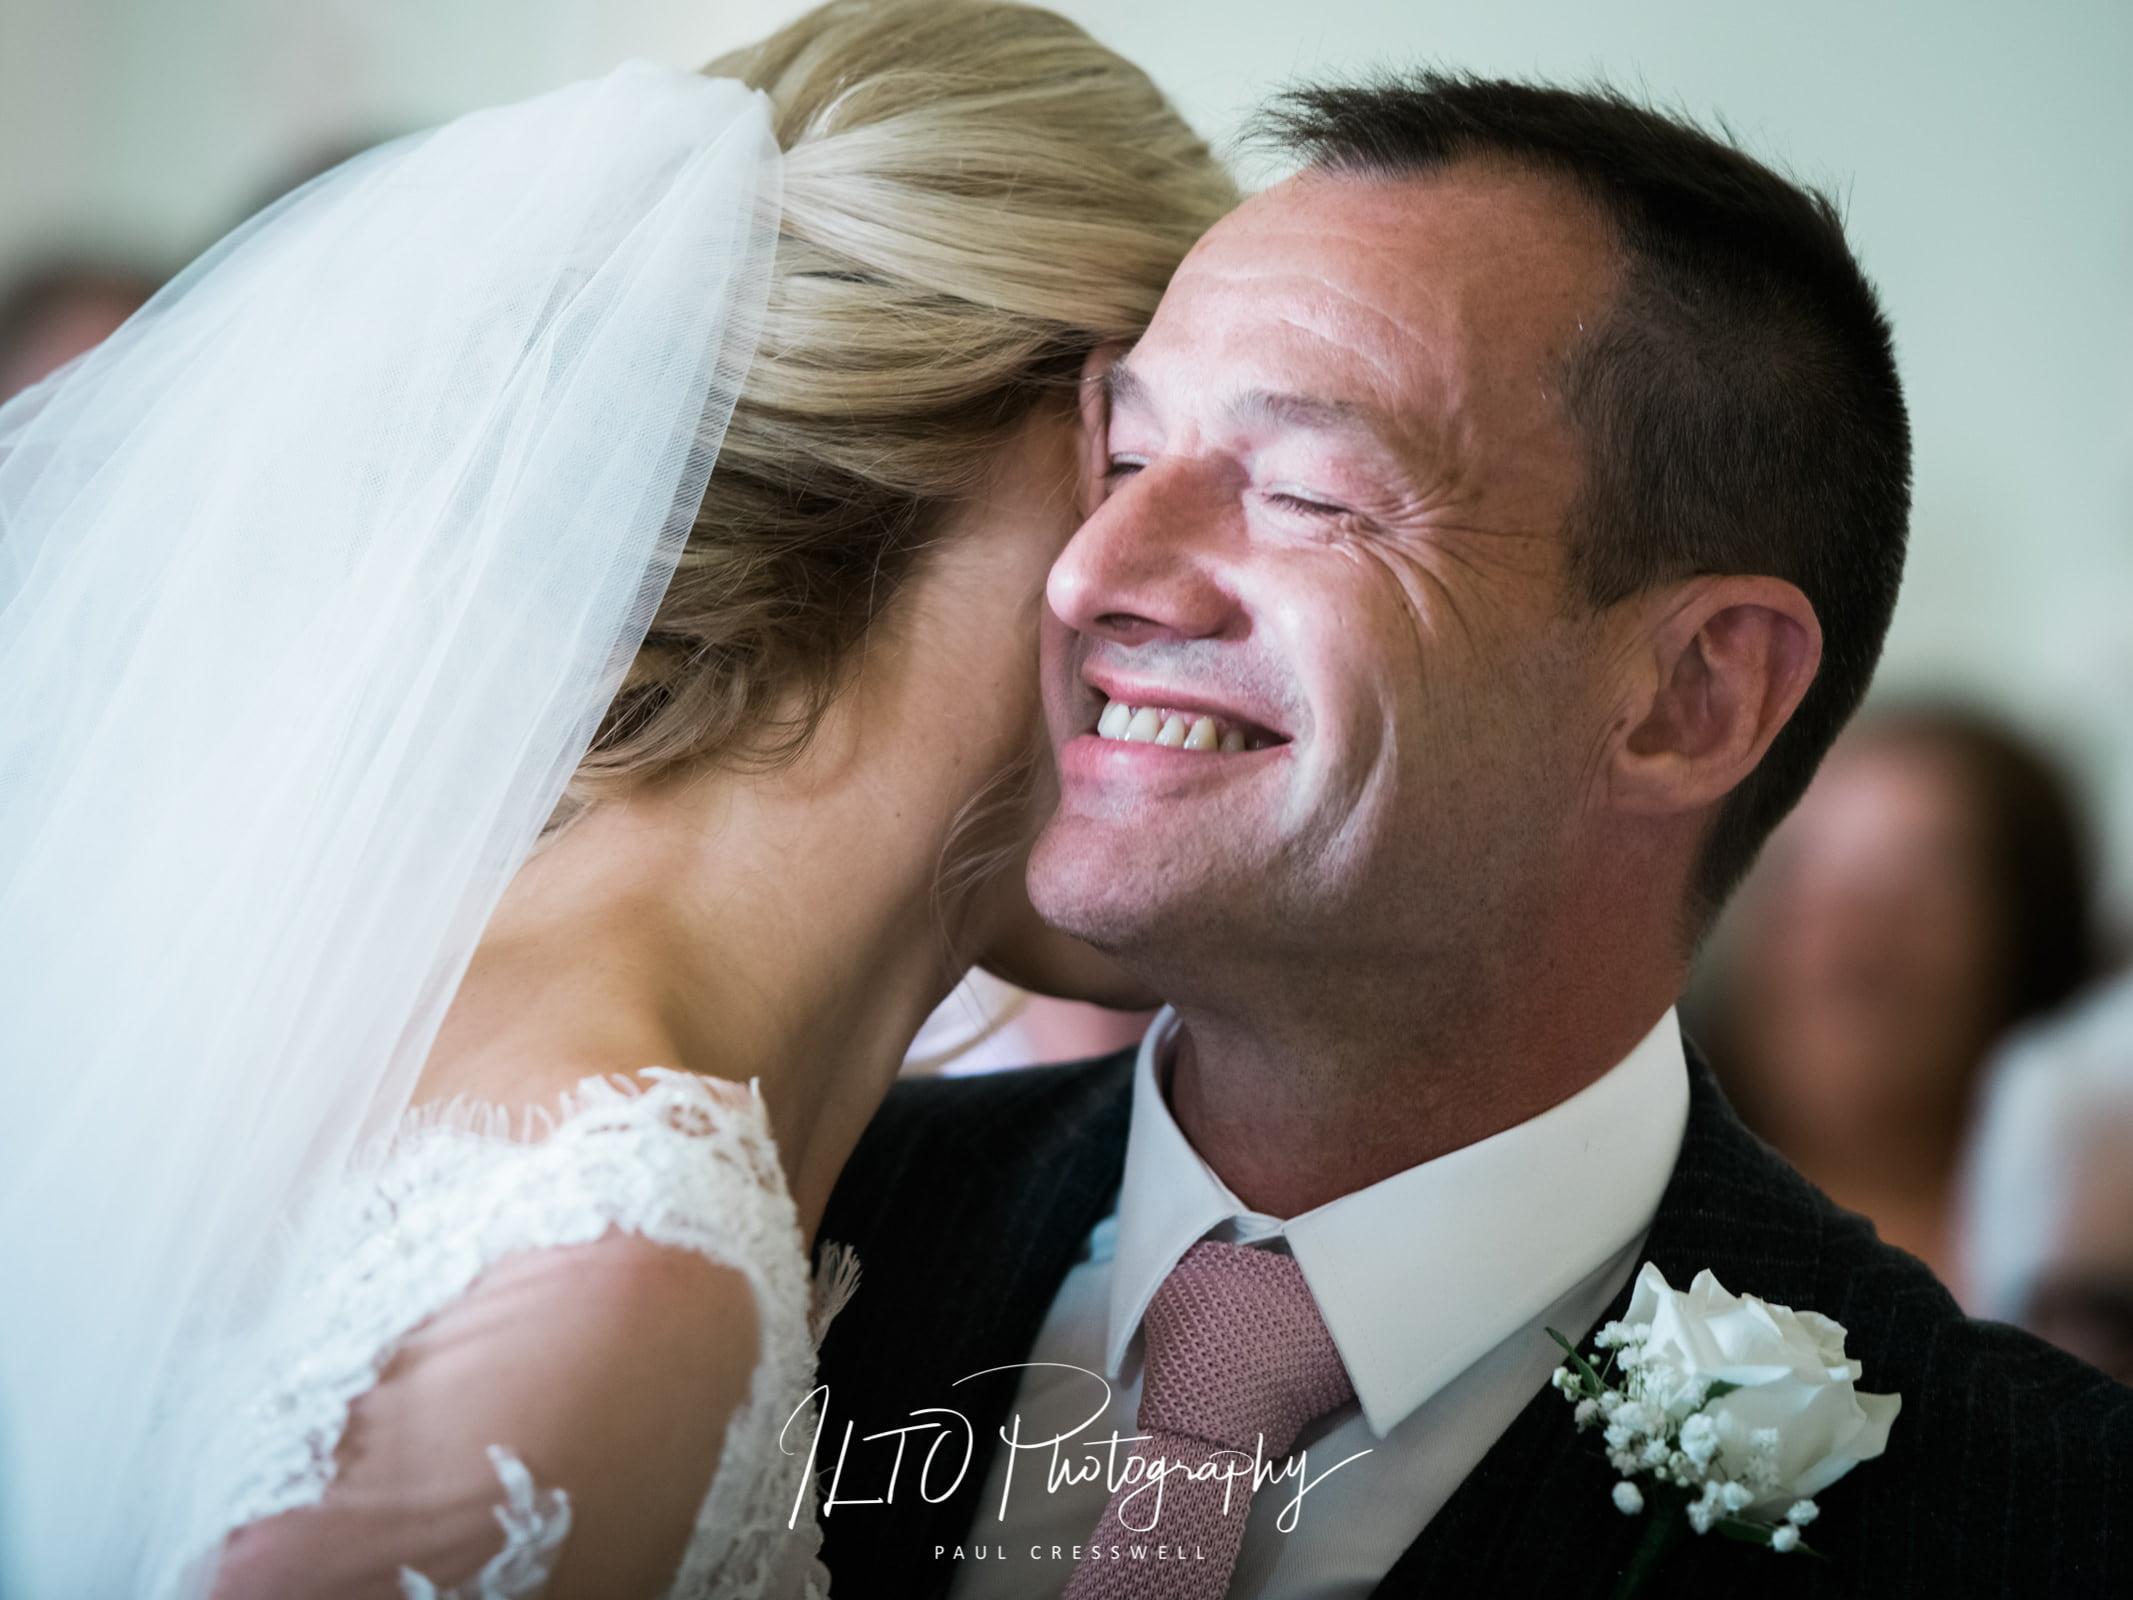 beautiful wedding photos leeds wedding photographer yorkshire near me